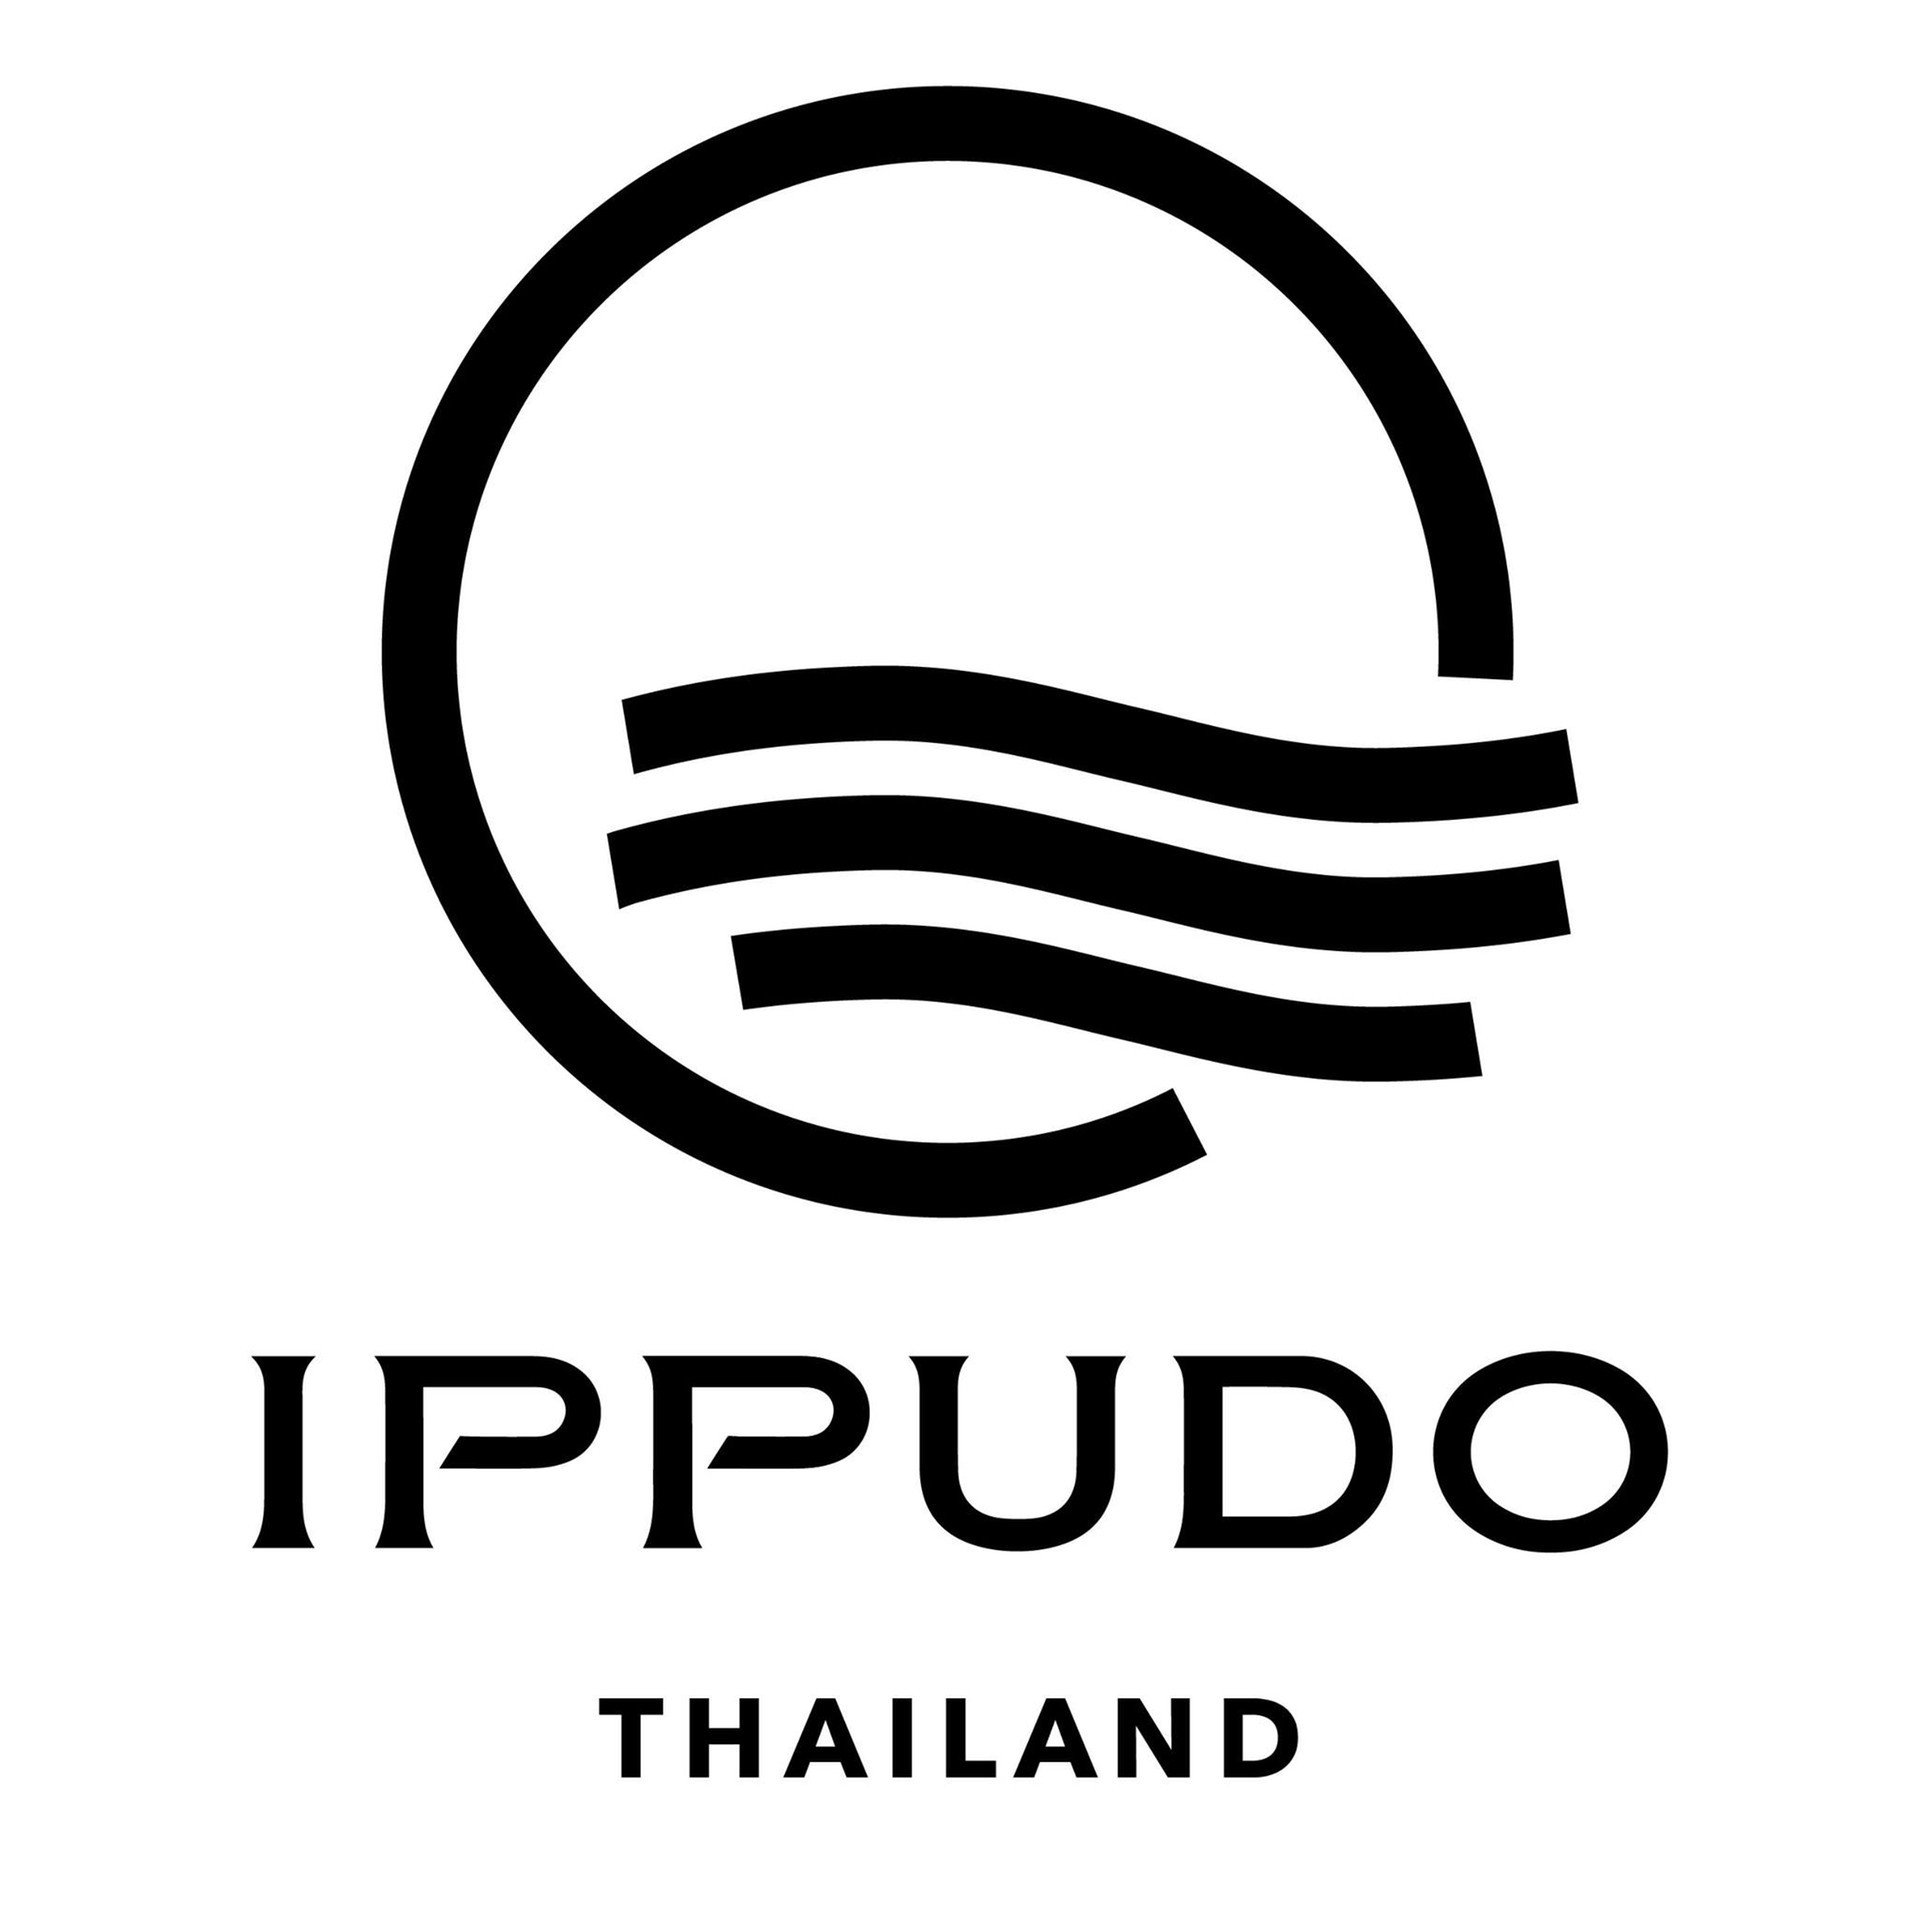 Ippudo (อิปปุโดะ)